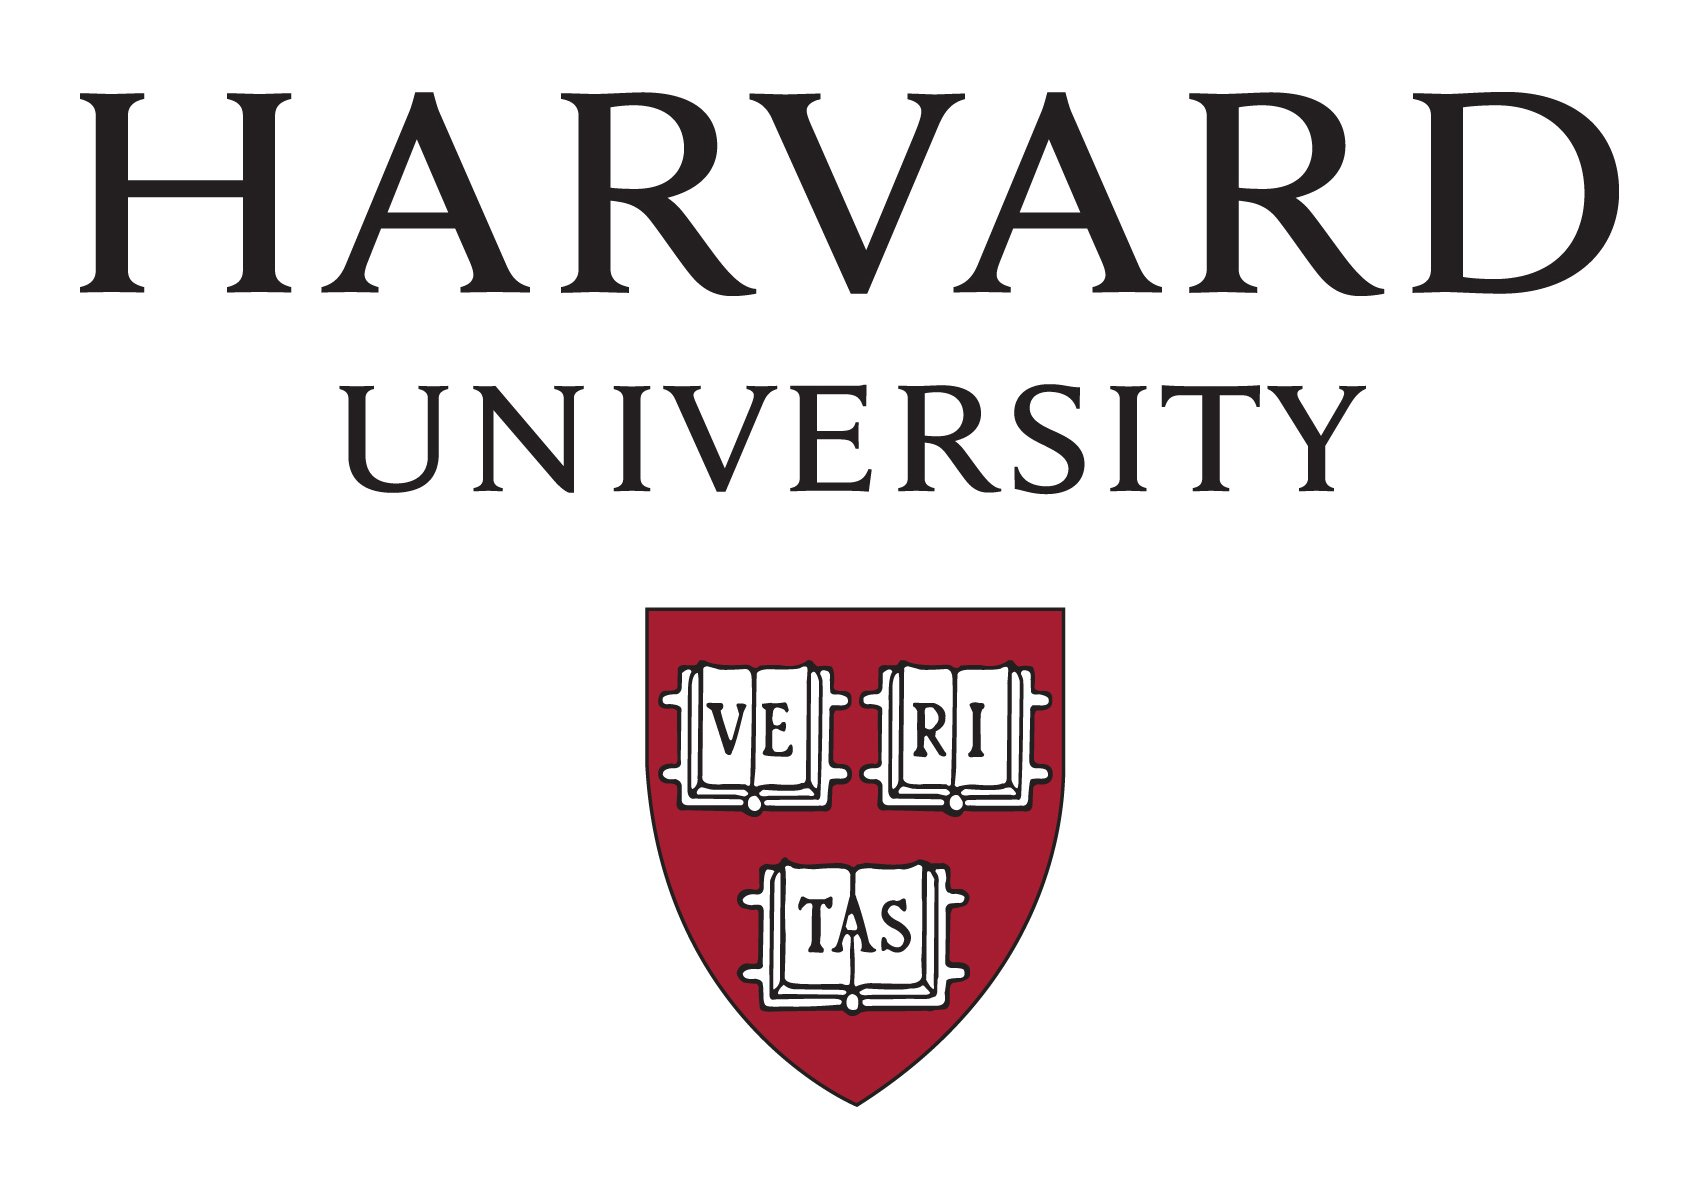 https://i0.wp.com/1000logos.net/wp-content/uploads/2017/02/Harvard-college-emblems.jpg